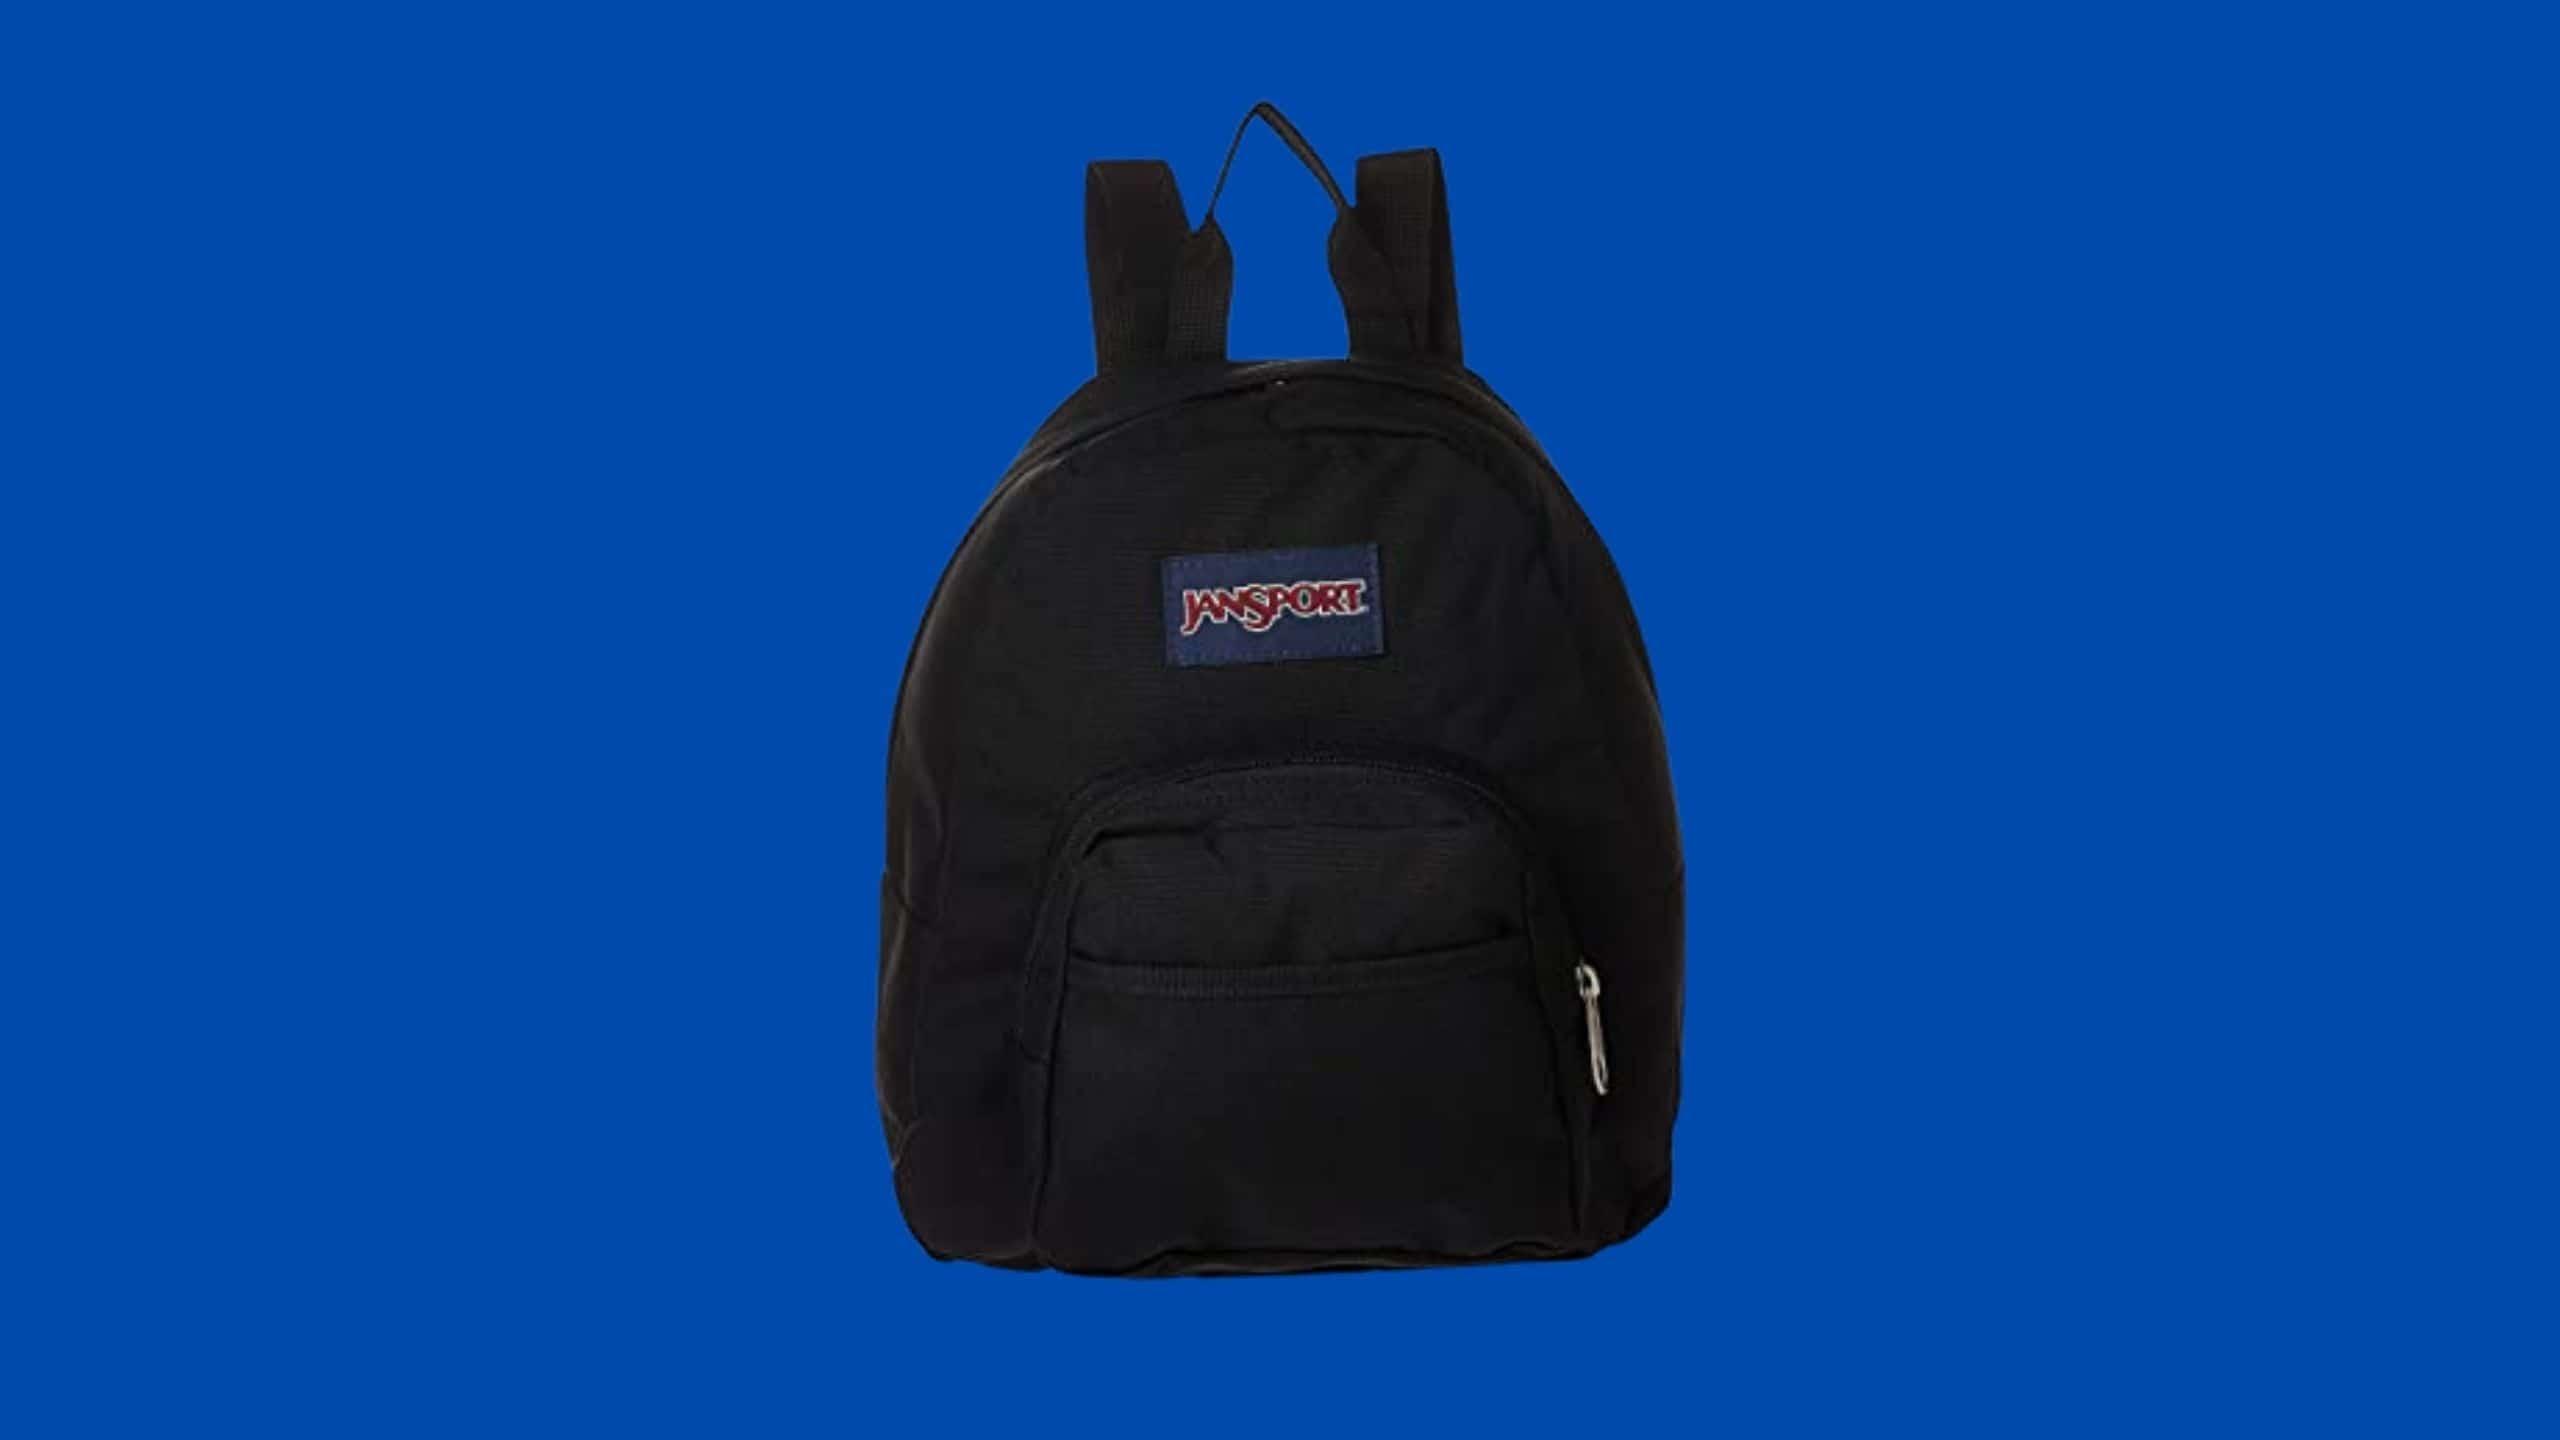 Half-pint Mini Backpack by Jansport